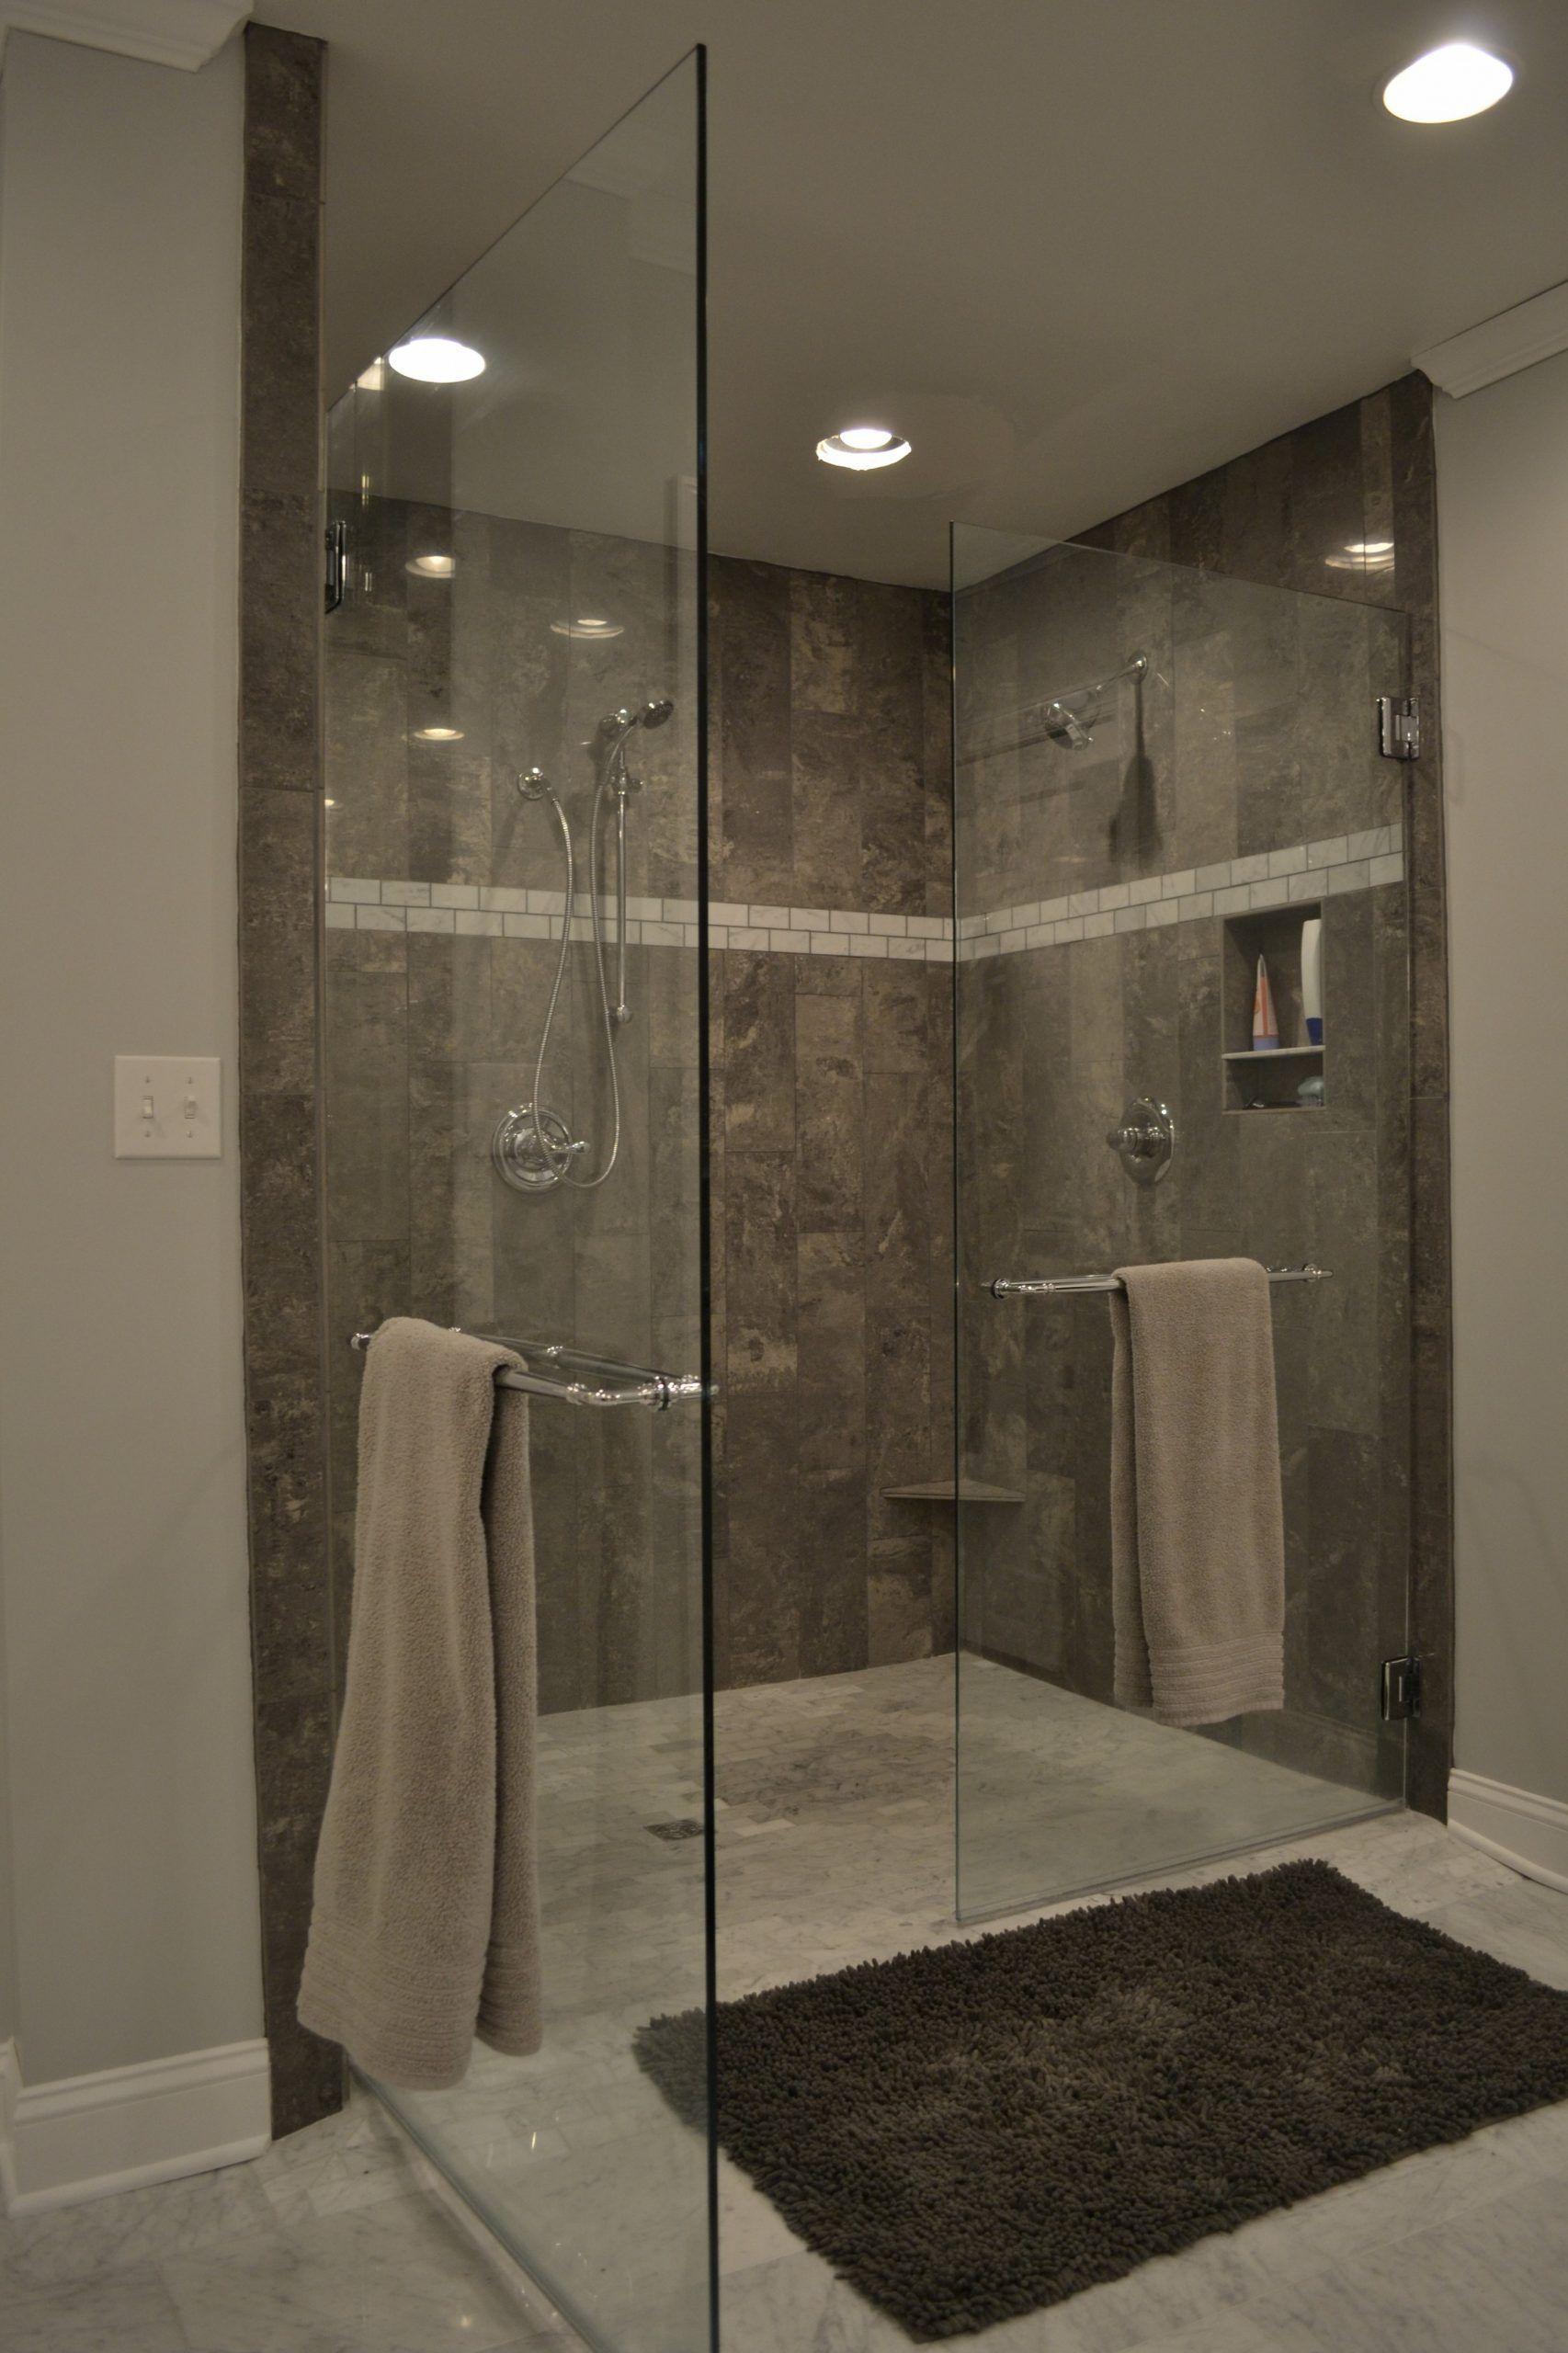 Bathroom Shower Tile Ideas Lowes In 2020 Gray Shower Tile Grey Bathroom Tiles Bathrooms Remodel